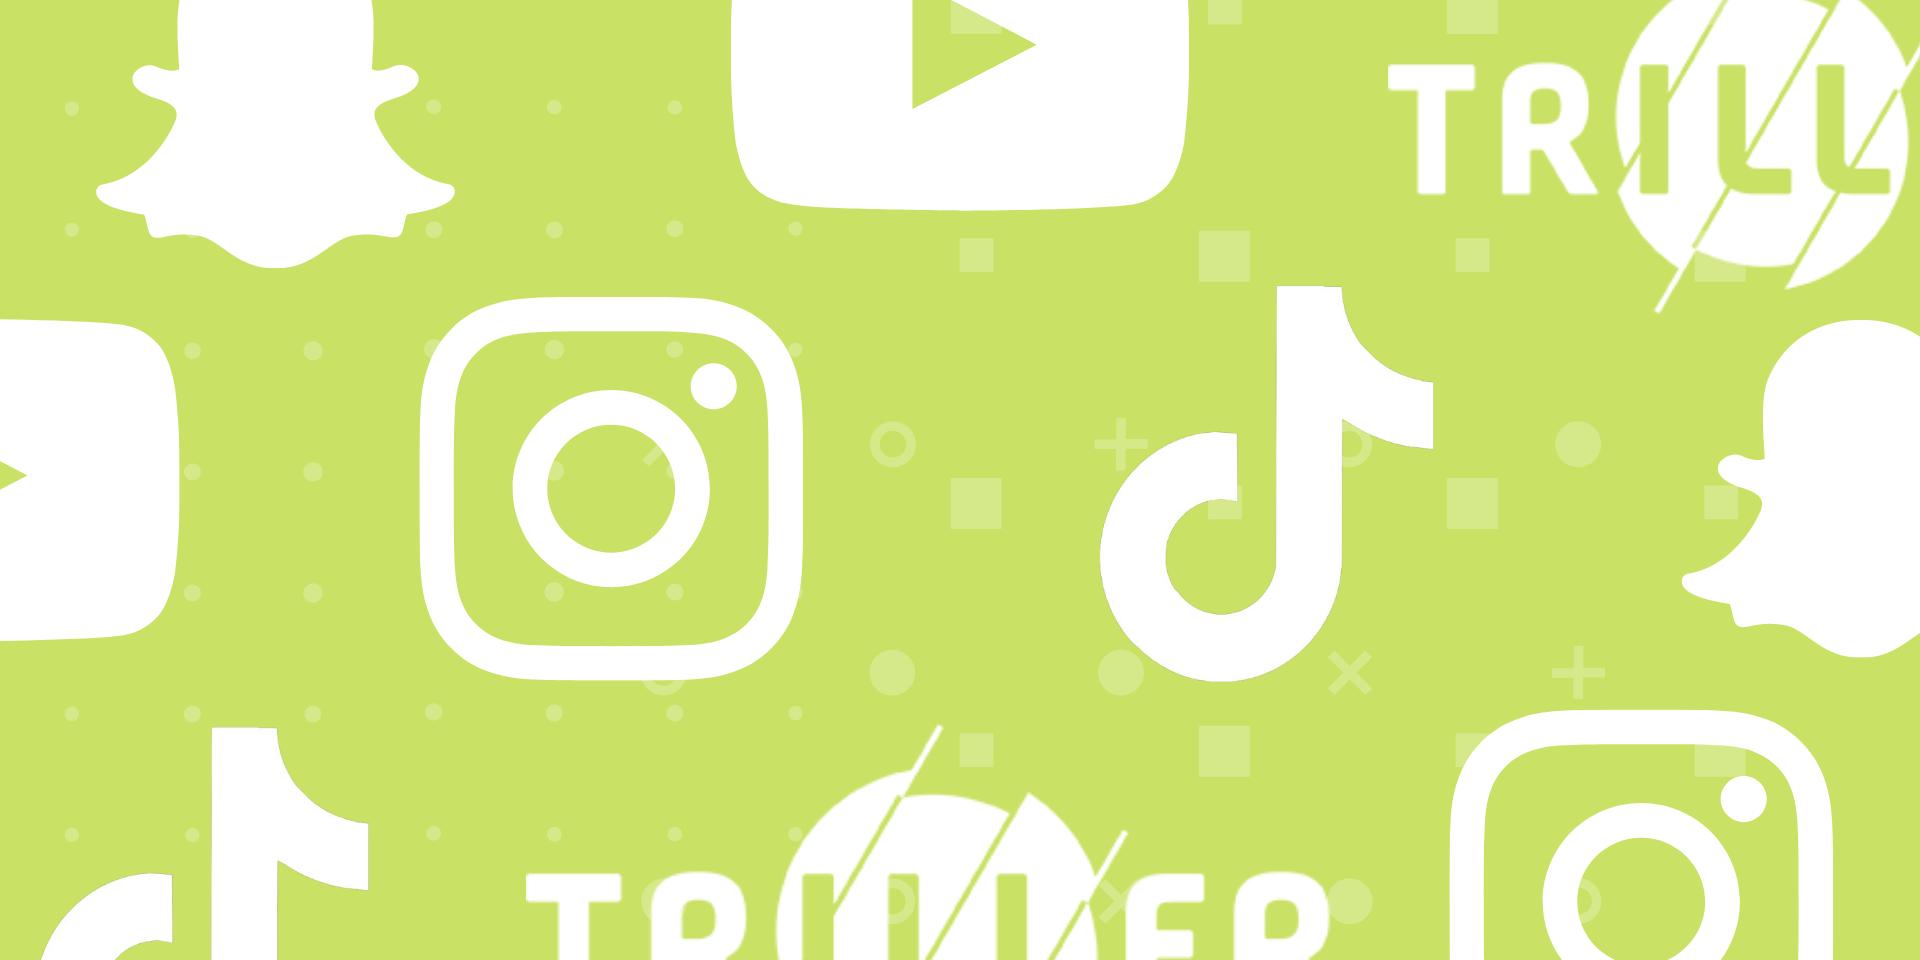 5 short-video platforms worth knowing – TikTok, Triller, Instagram Reels, and more